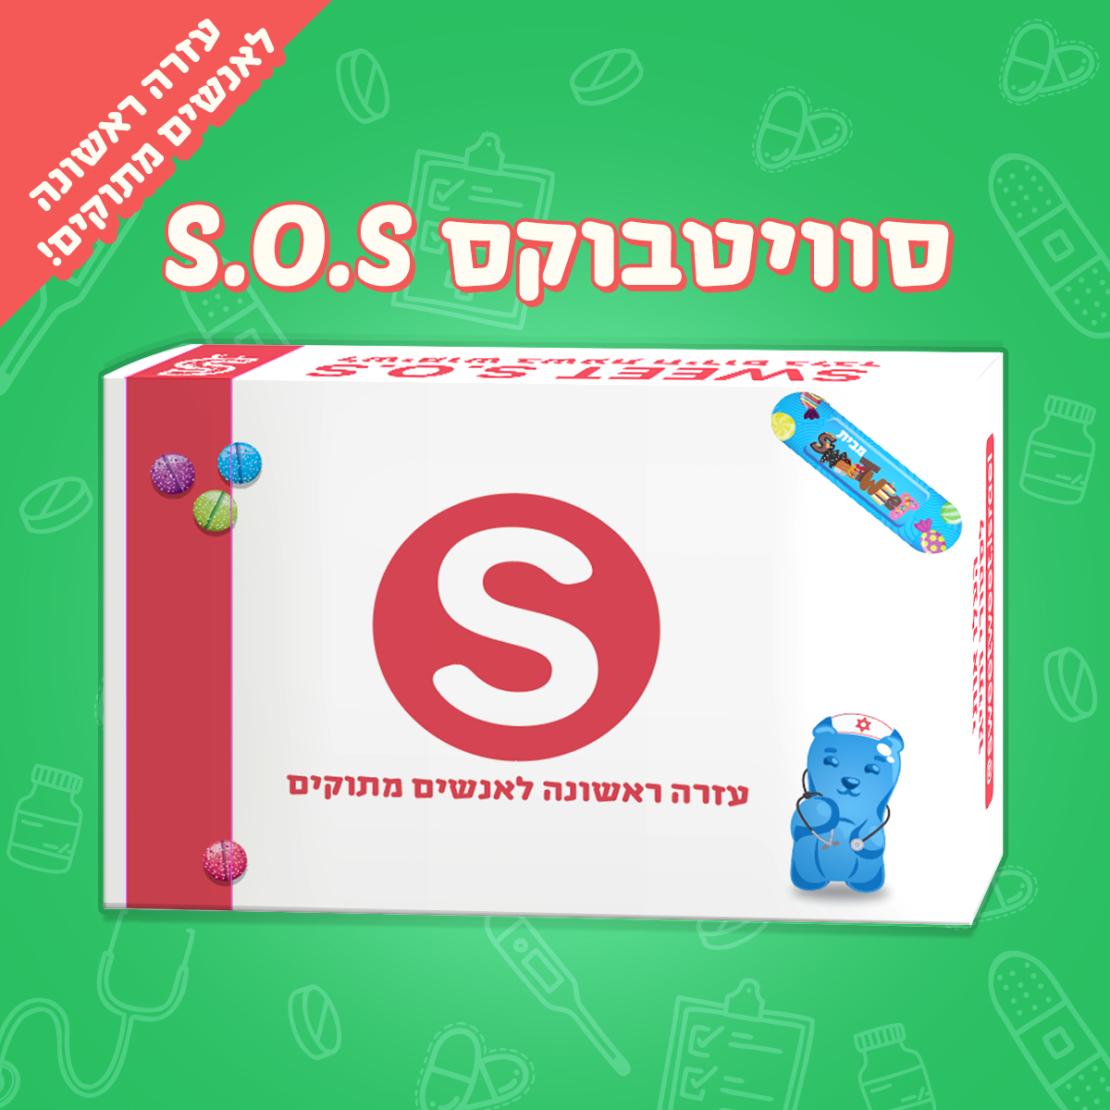 SweetBox SOS - עזרה ראשונה לאנשים מתוקים